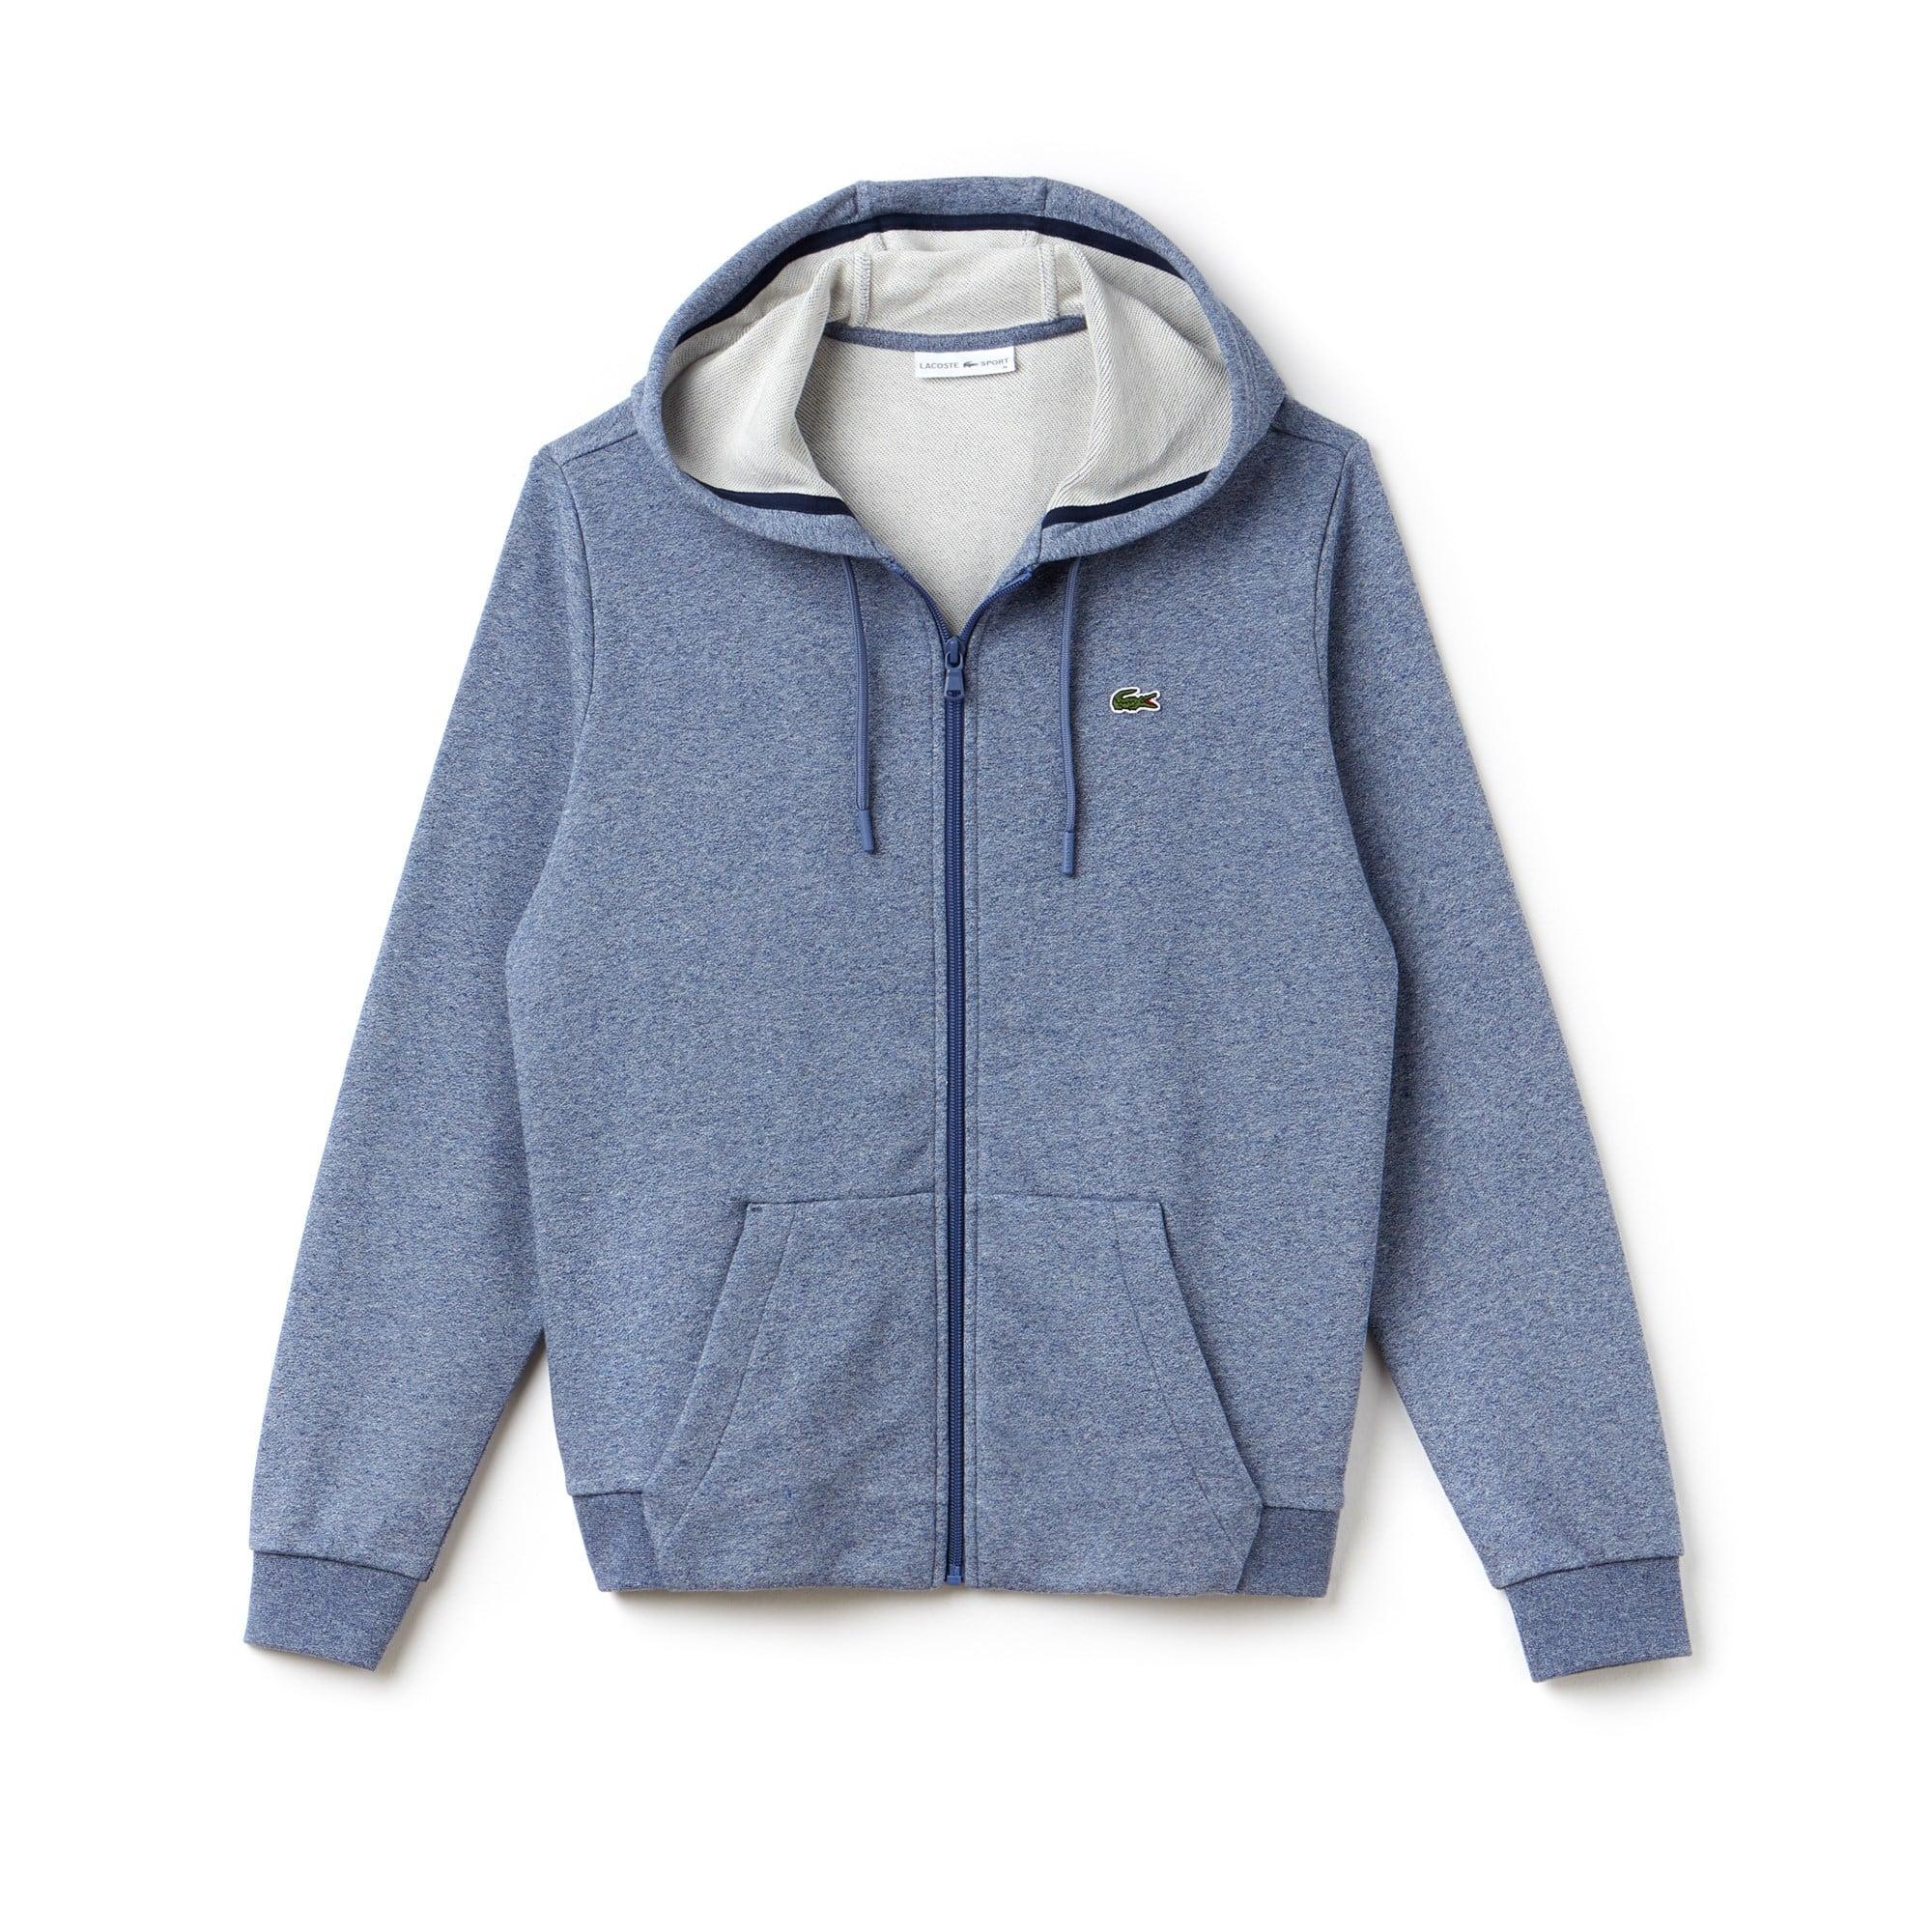 Damen-Sweatshirt aus Fleece mit Kapuze LACOSTE SPORT TENNIS